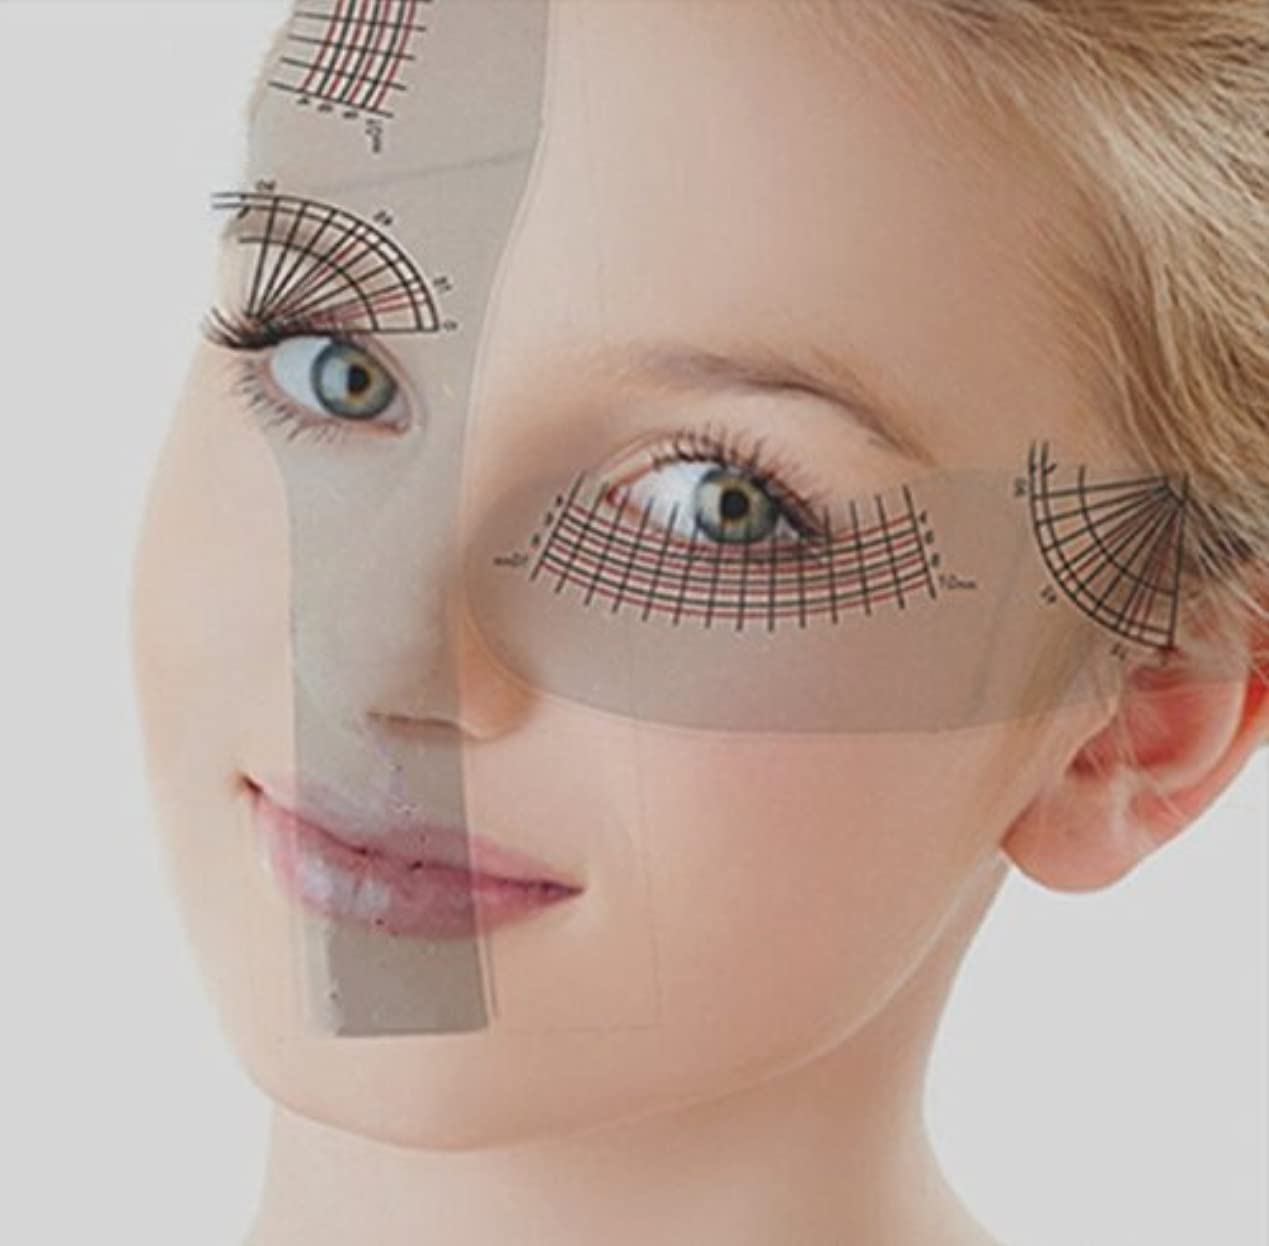 CHENGYIDA 5個 クリア プラスチック製 アイラッシュ  つげまつげ カール 長さ 測定 定規 実用的なツール 定規 見やすい方眼定規